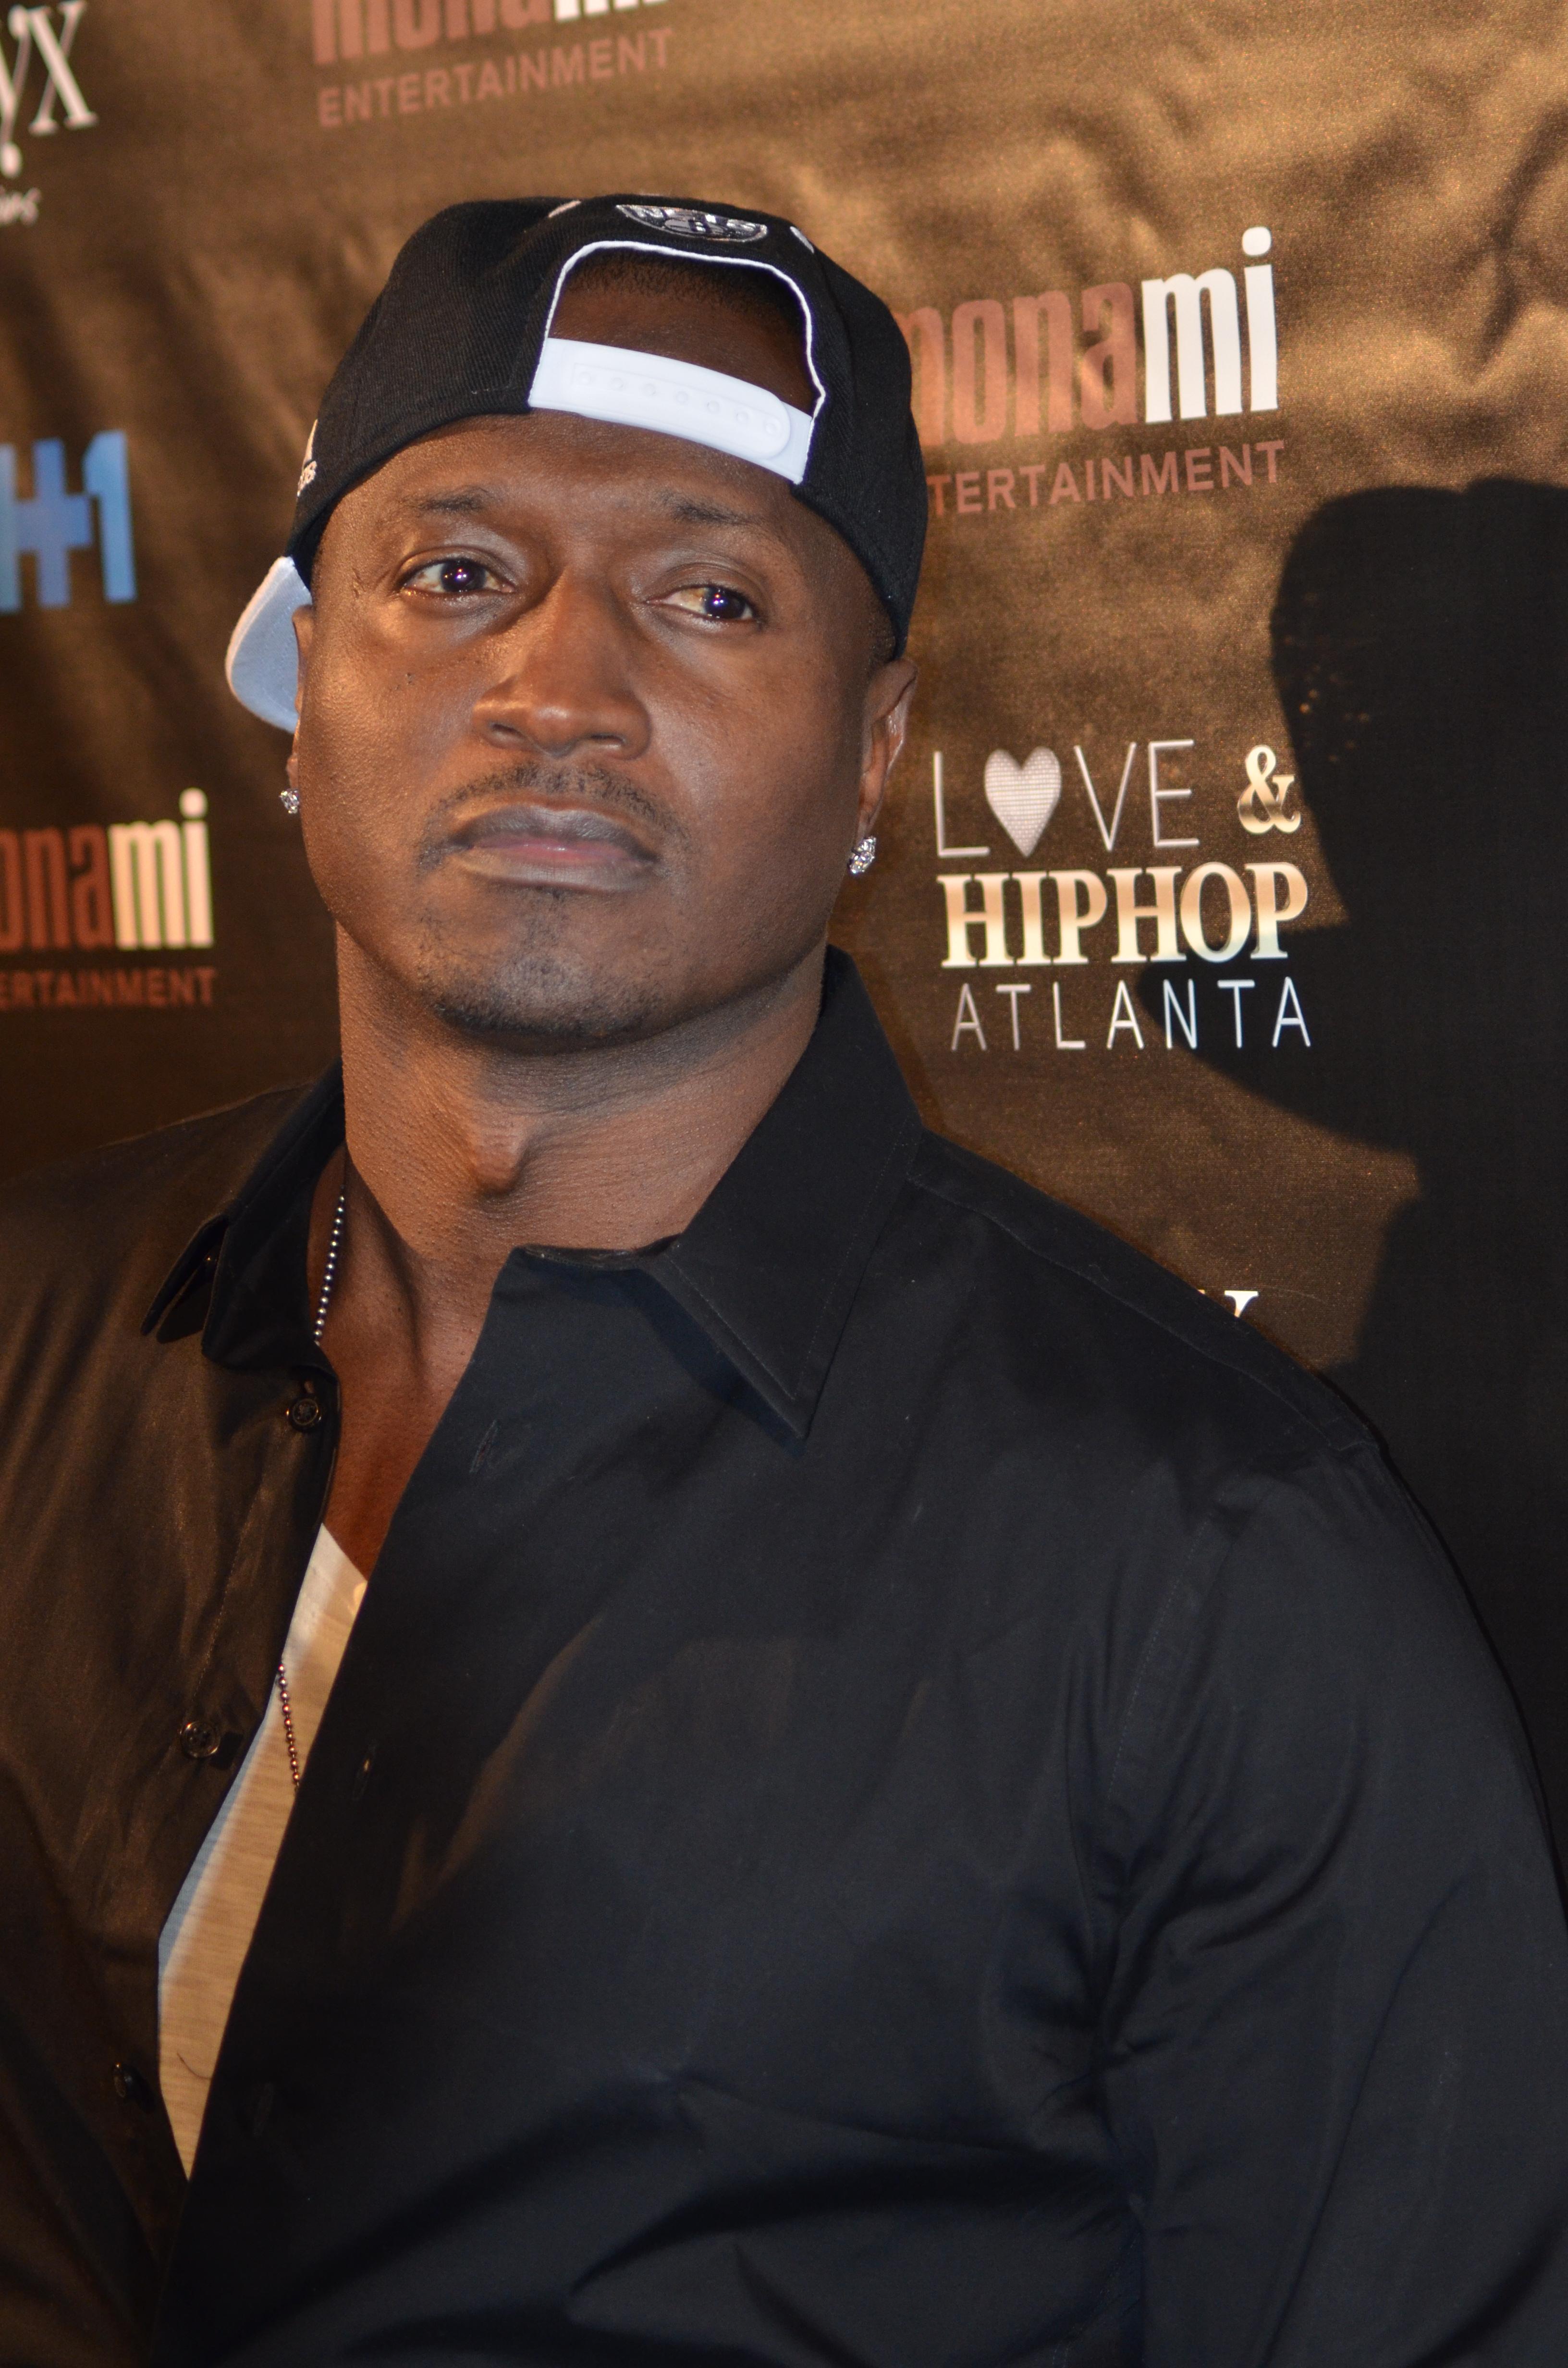 Love & Hip Hop Atlanta Season 2 Kicks Off With Premiere ... | 3264 x 4928 jpeg 3917kB